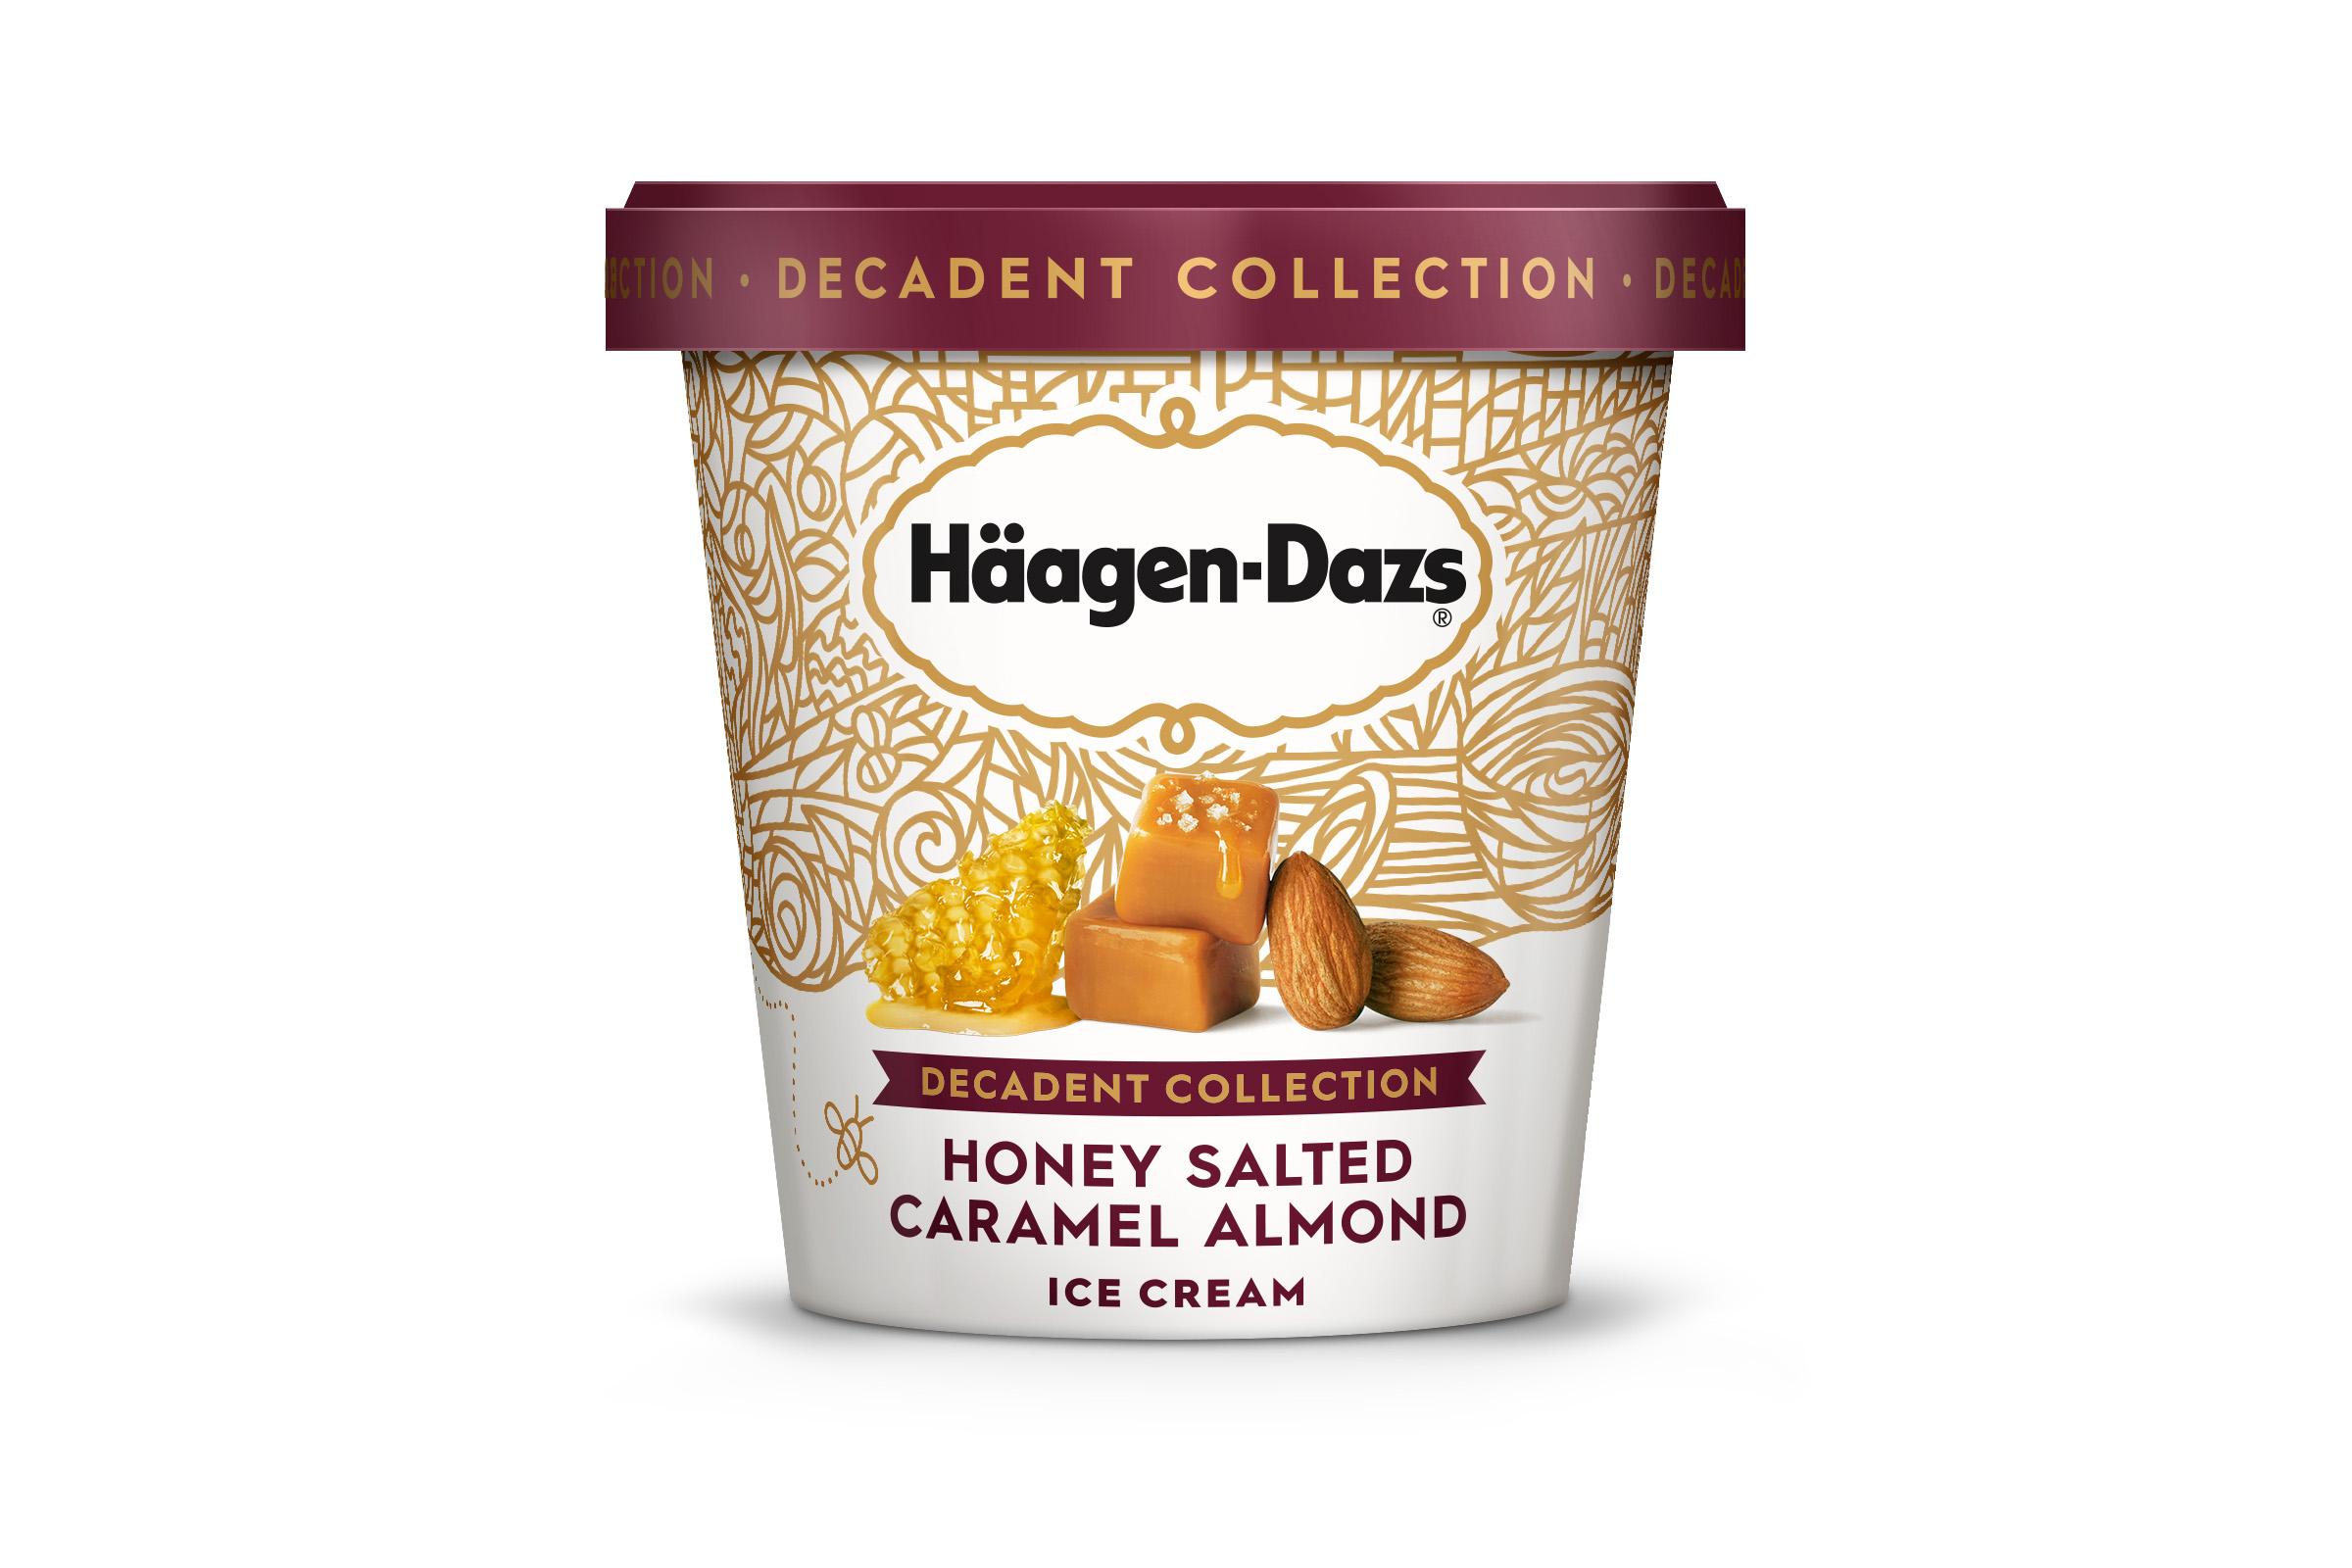 Häagen-Dazs® Honey Salted Caramel Almond Ice Cream Packaging